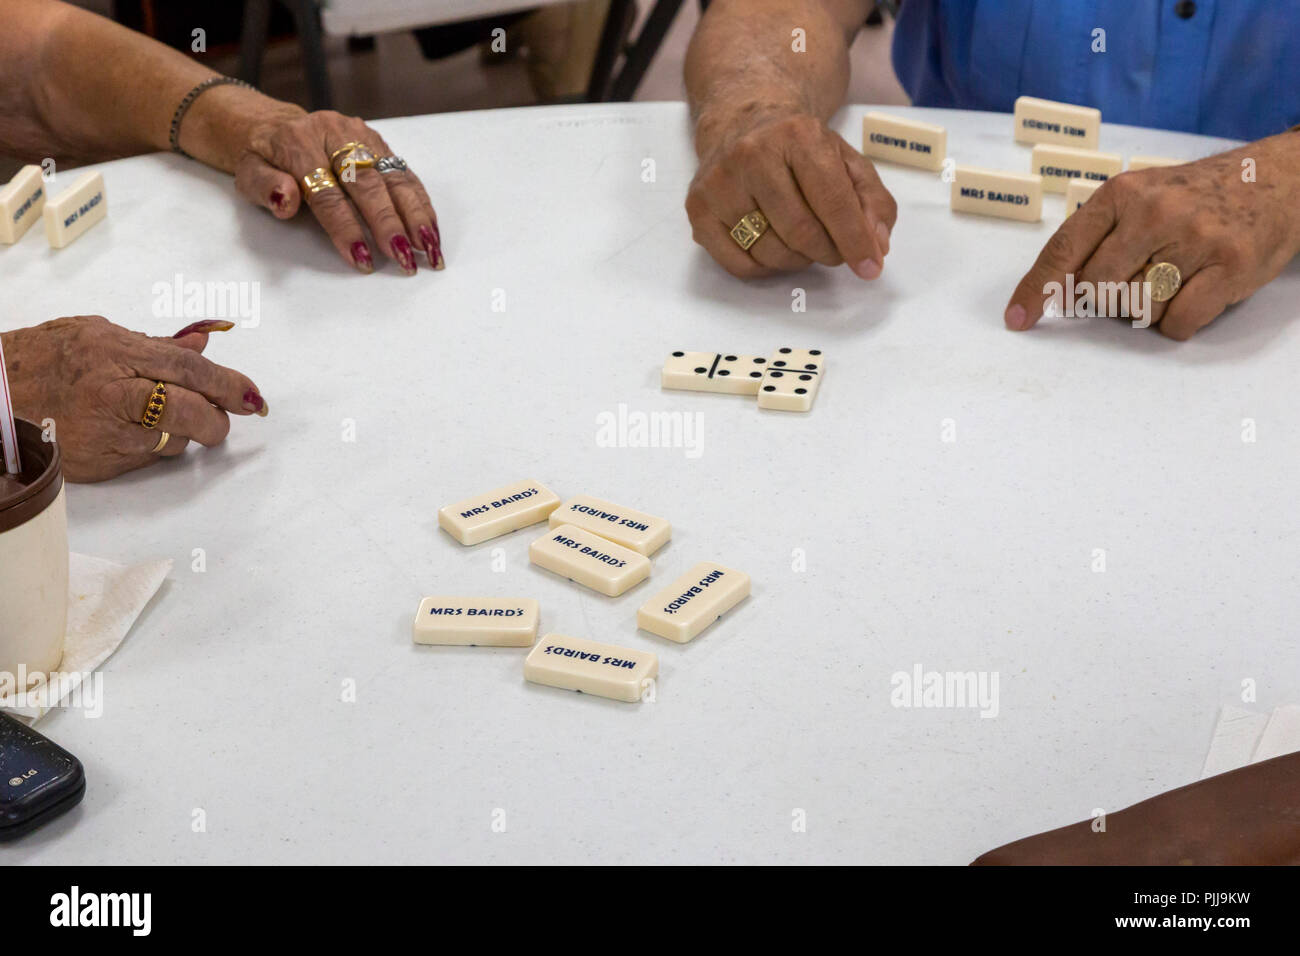 Houston, Texas - Senior citizens play dominoes at Wesley Community Center. - Stock Image